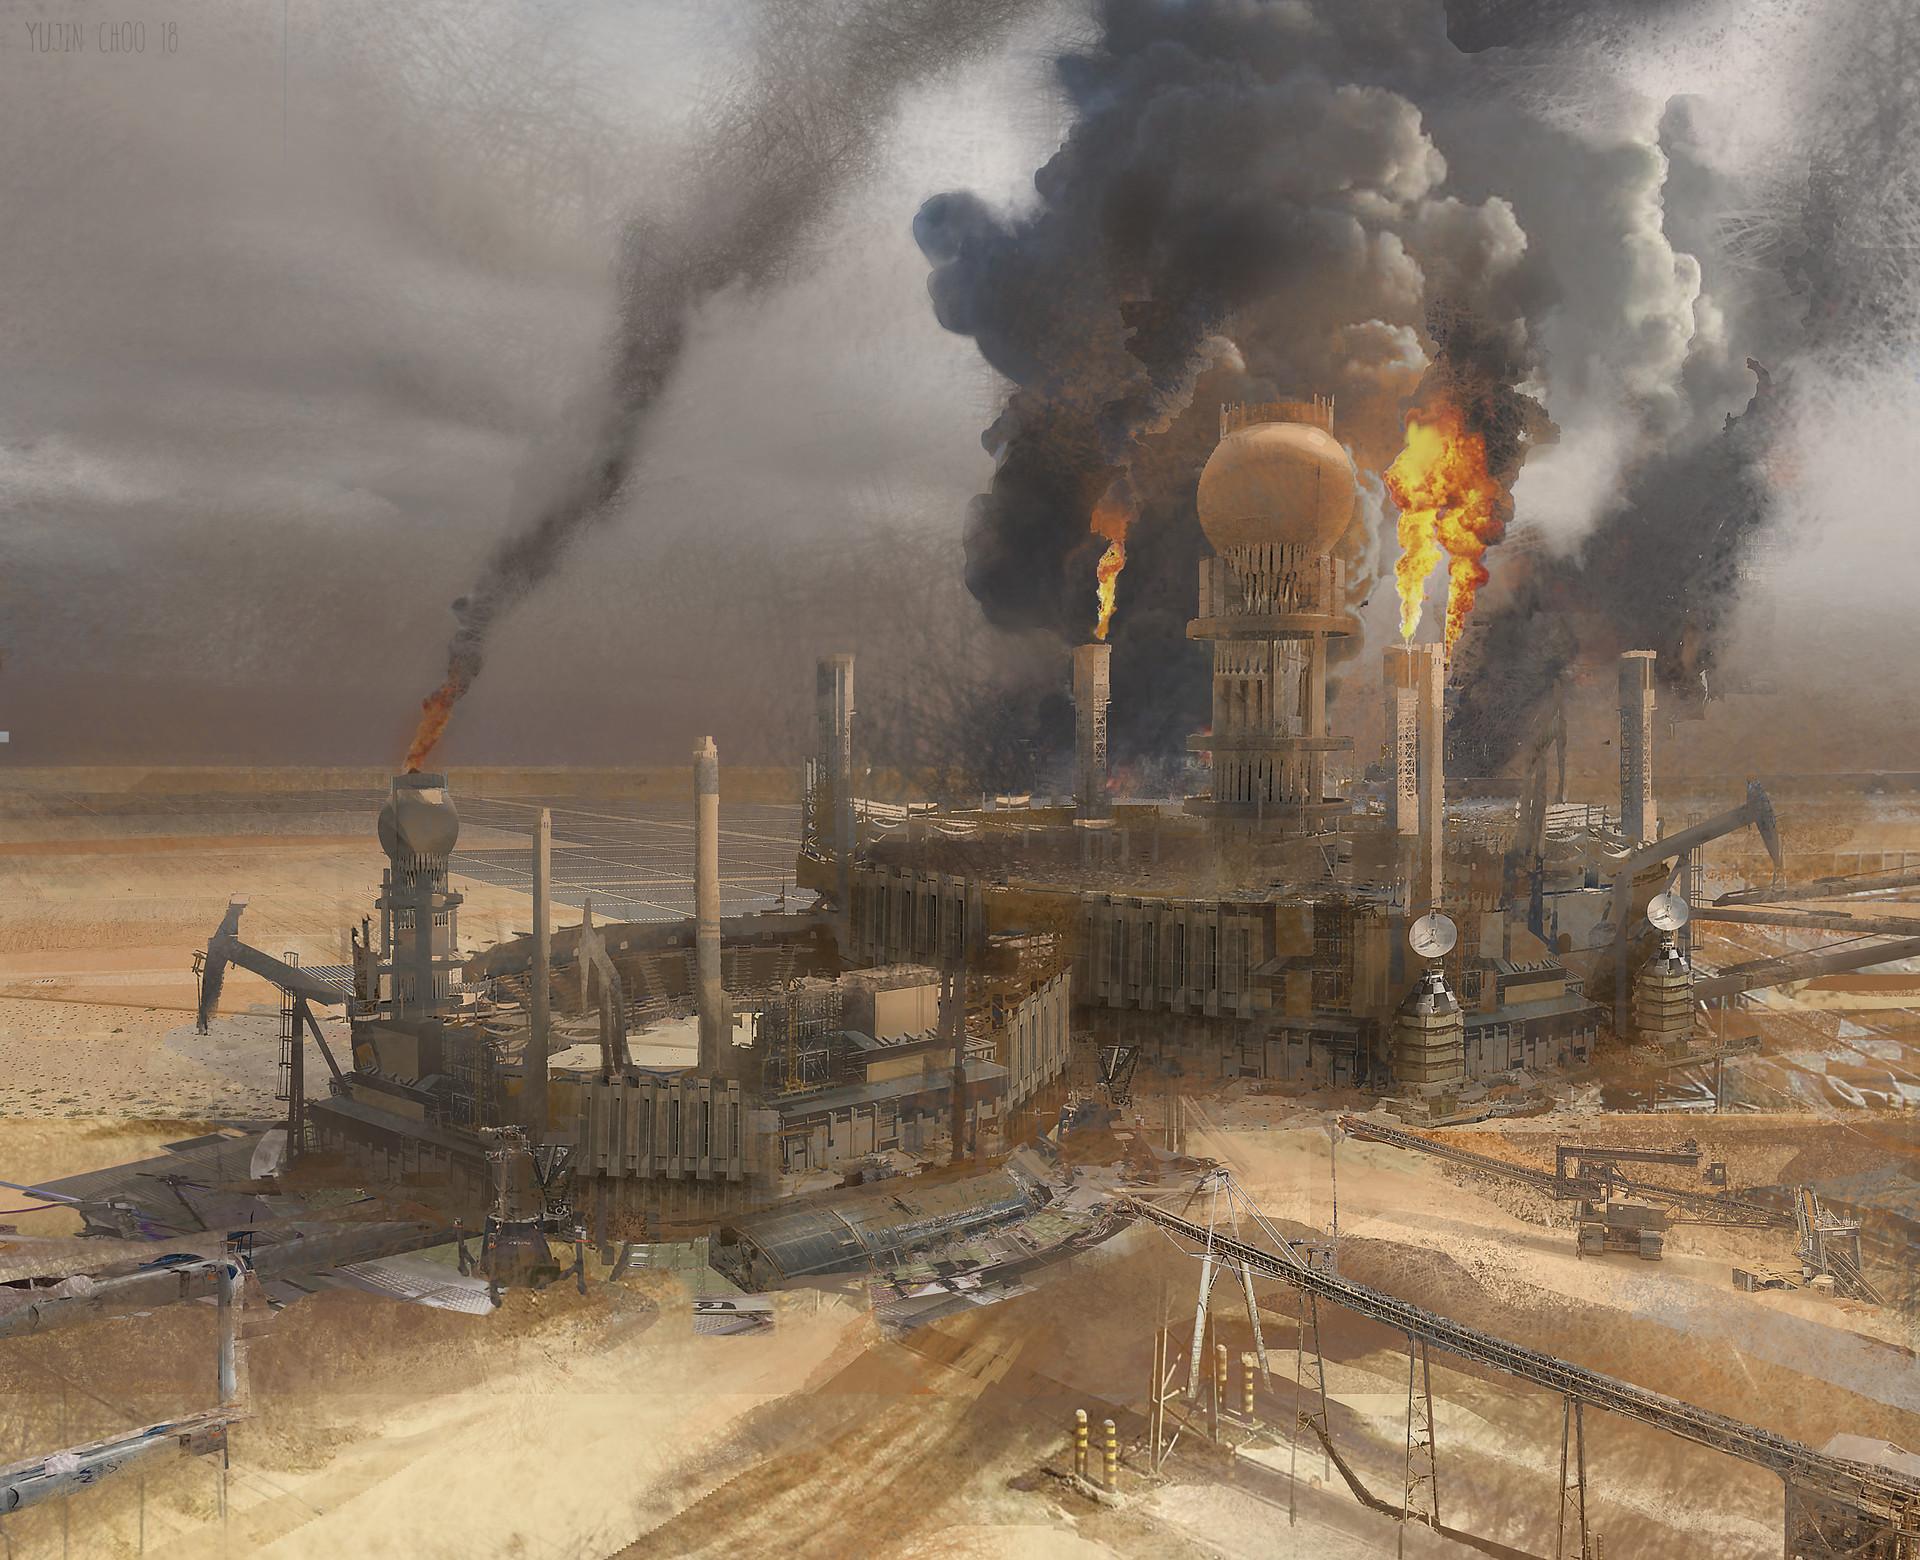 Yujin choo oilfield finish